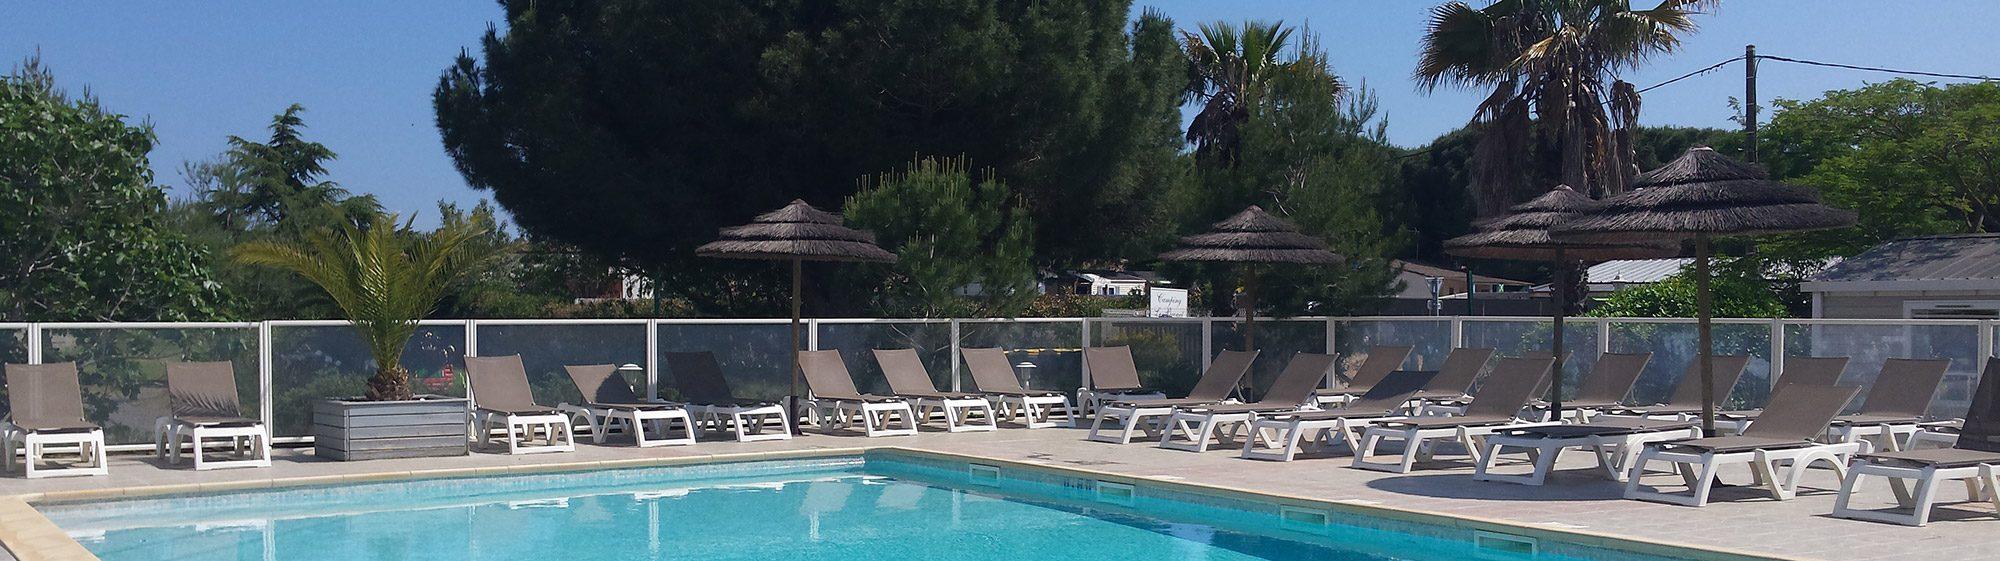 Camping avec piscine à Agde